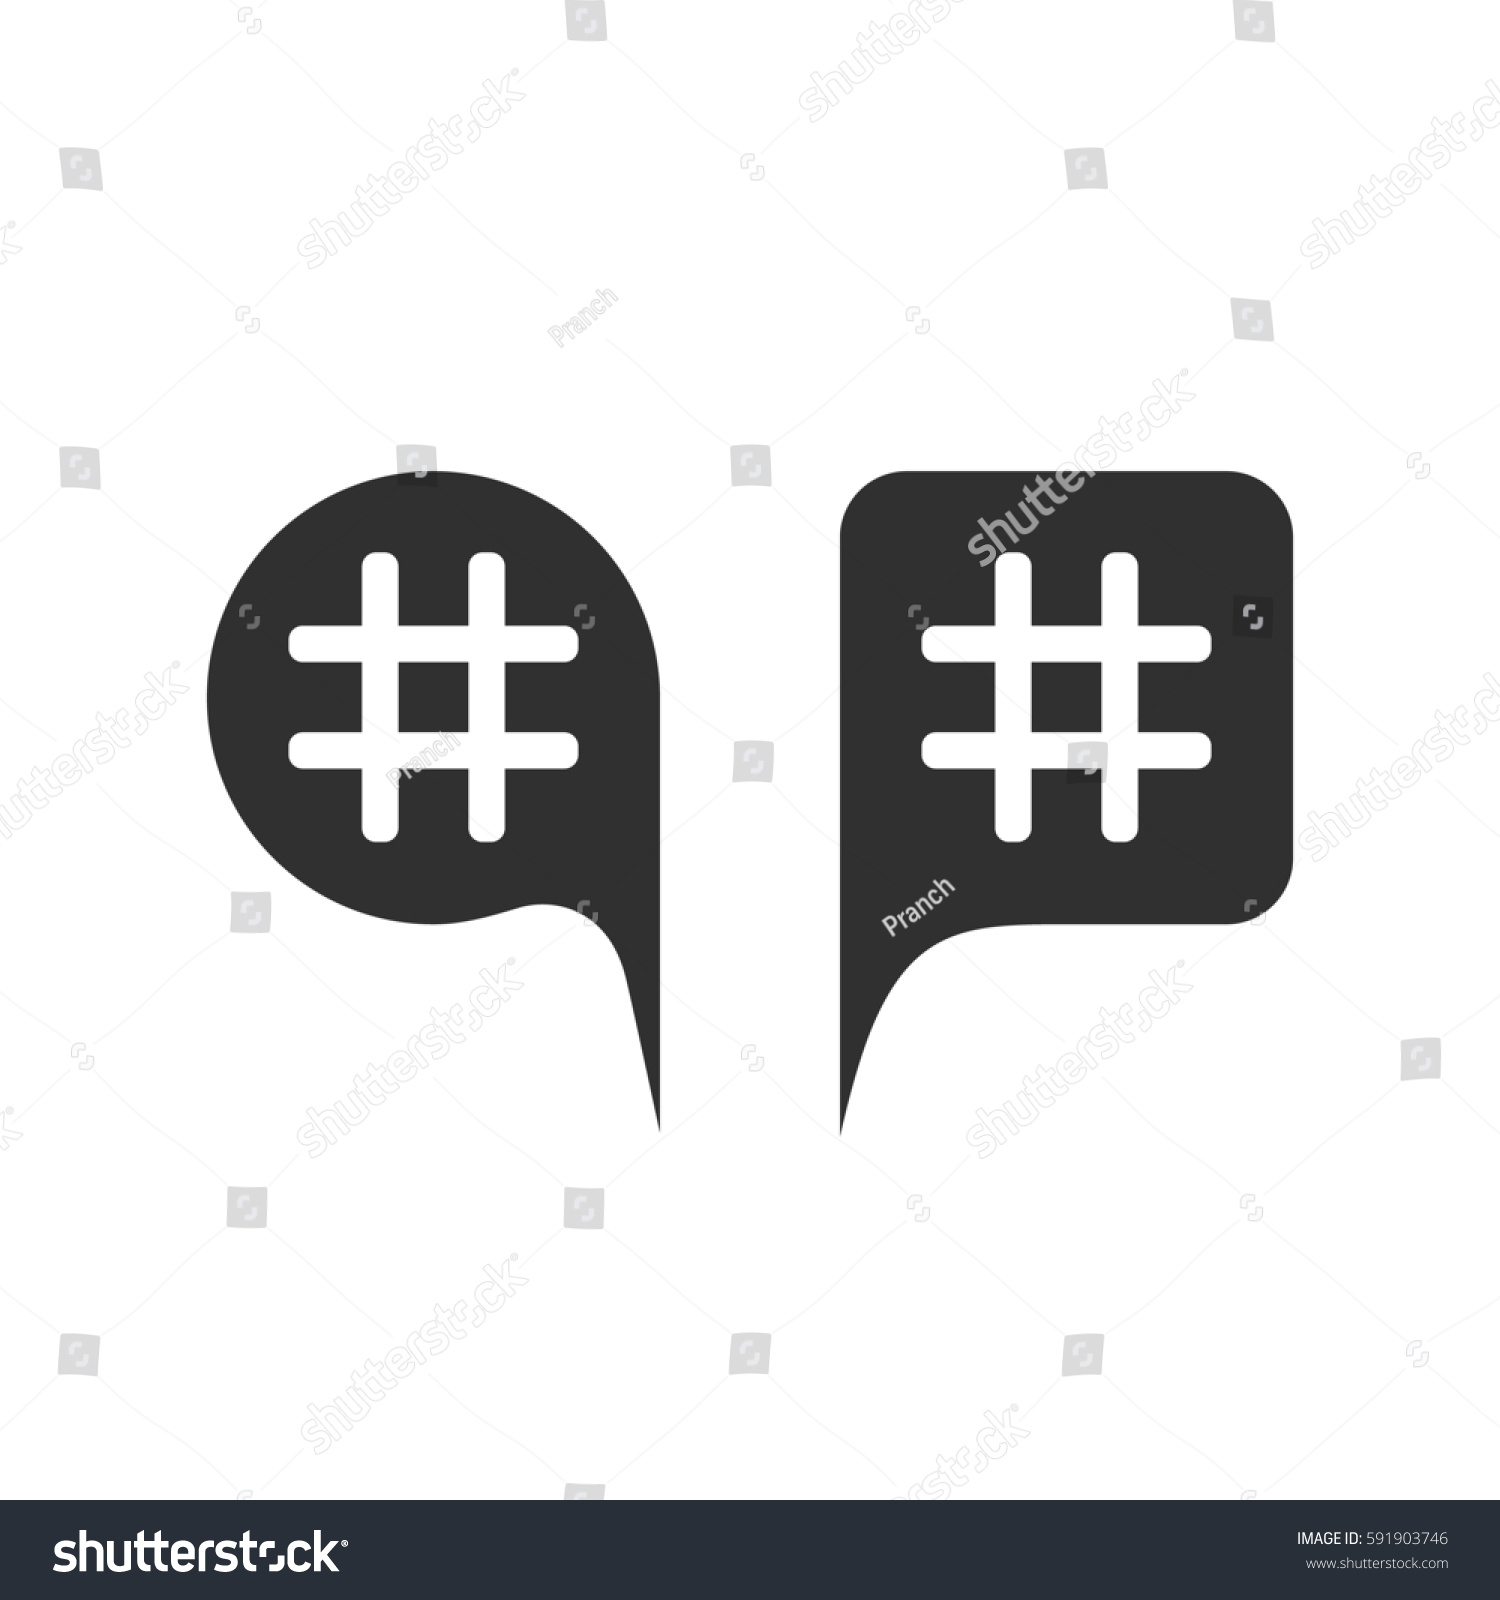 Hashtag Black Speech Bubbles Concept Micro Stock Illustration